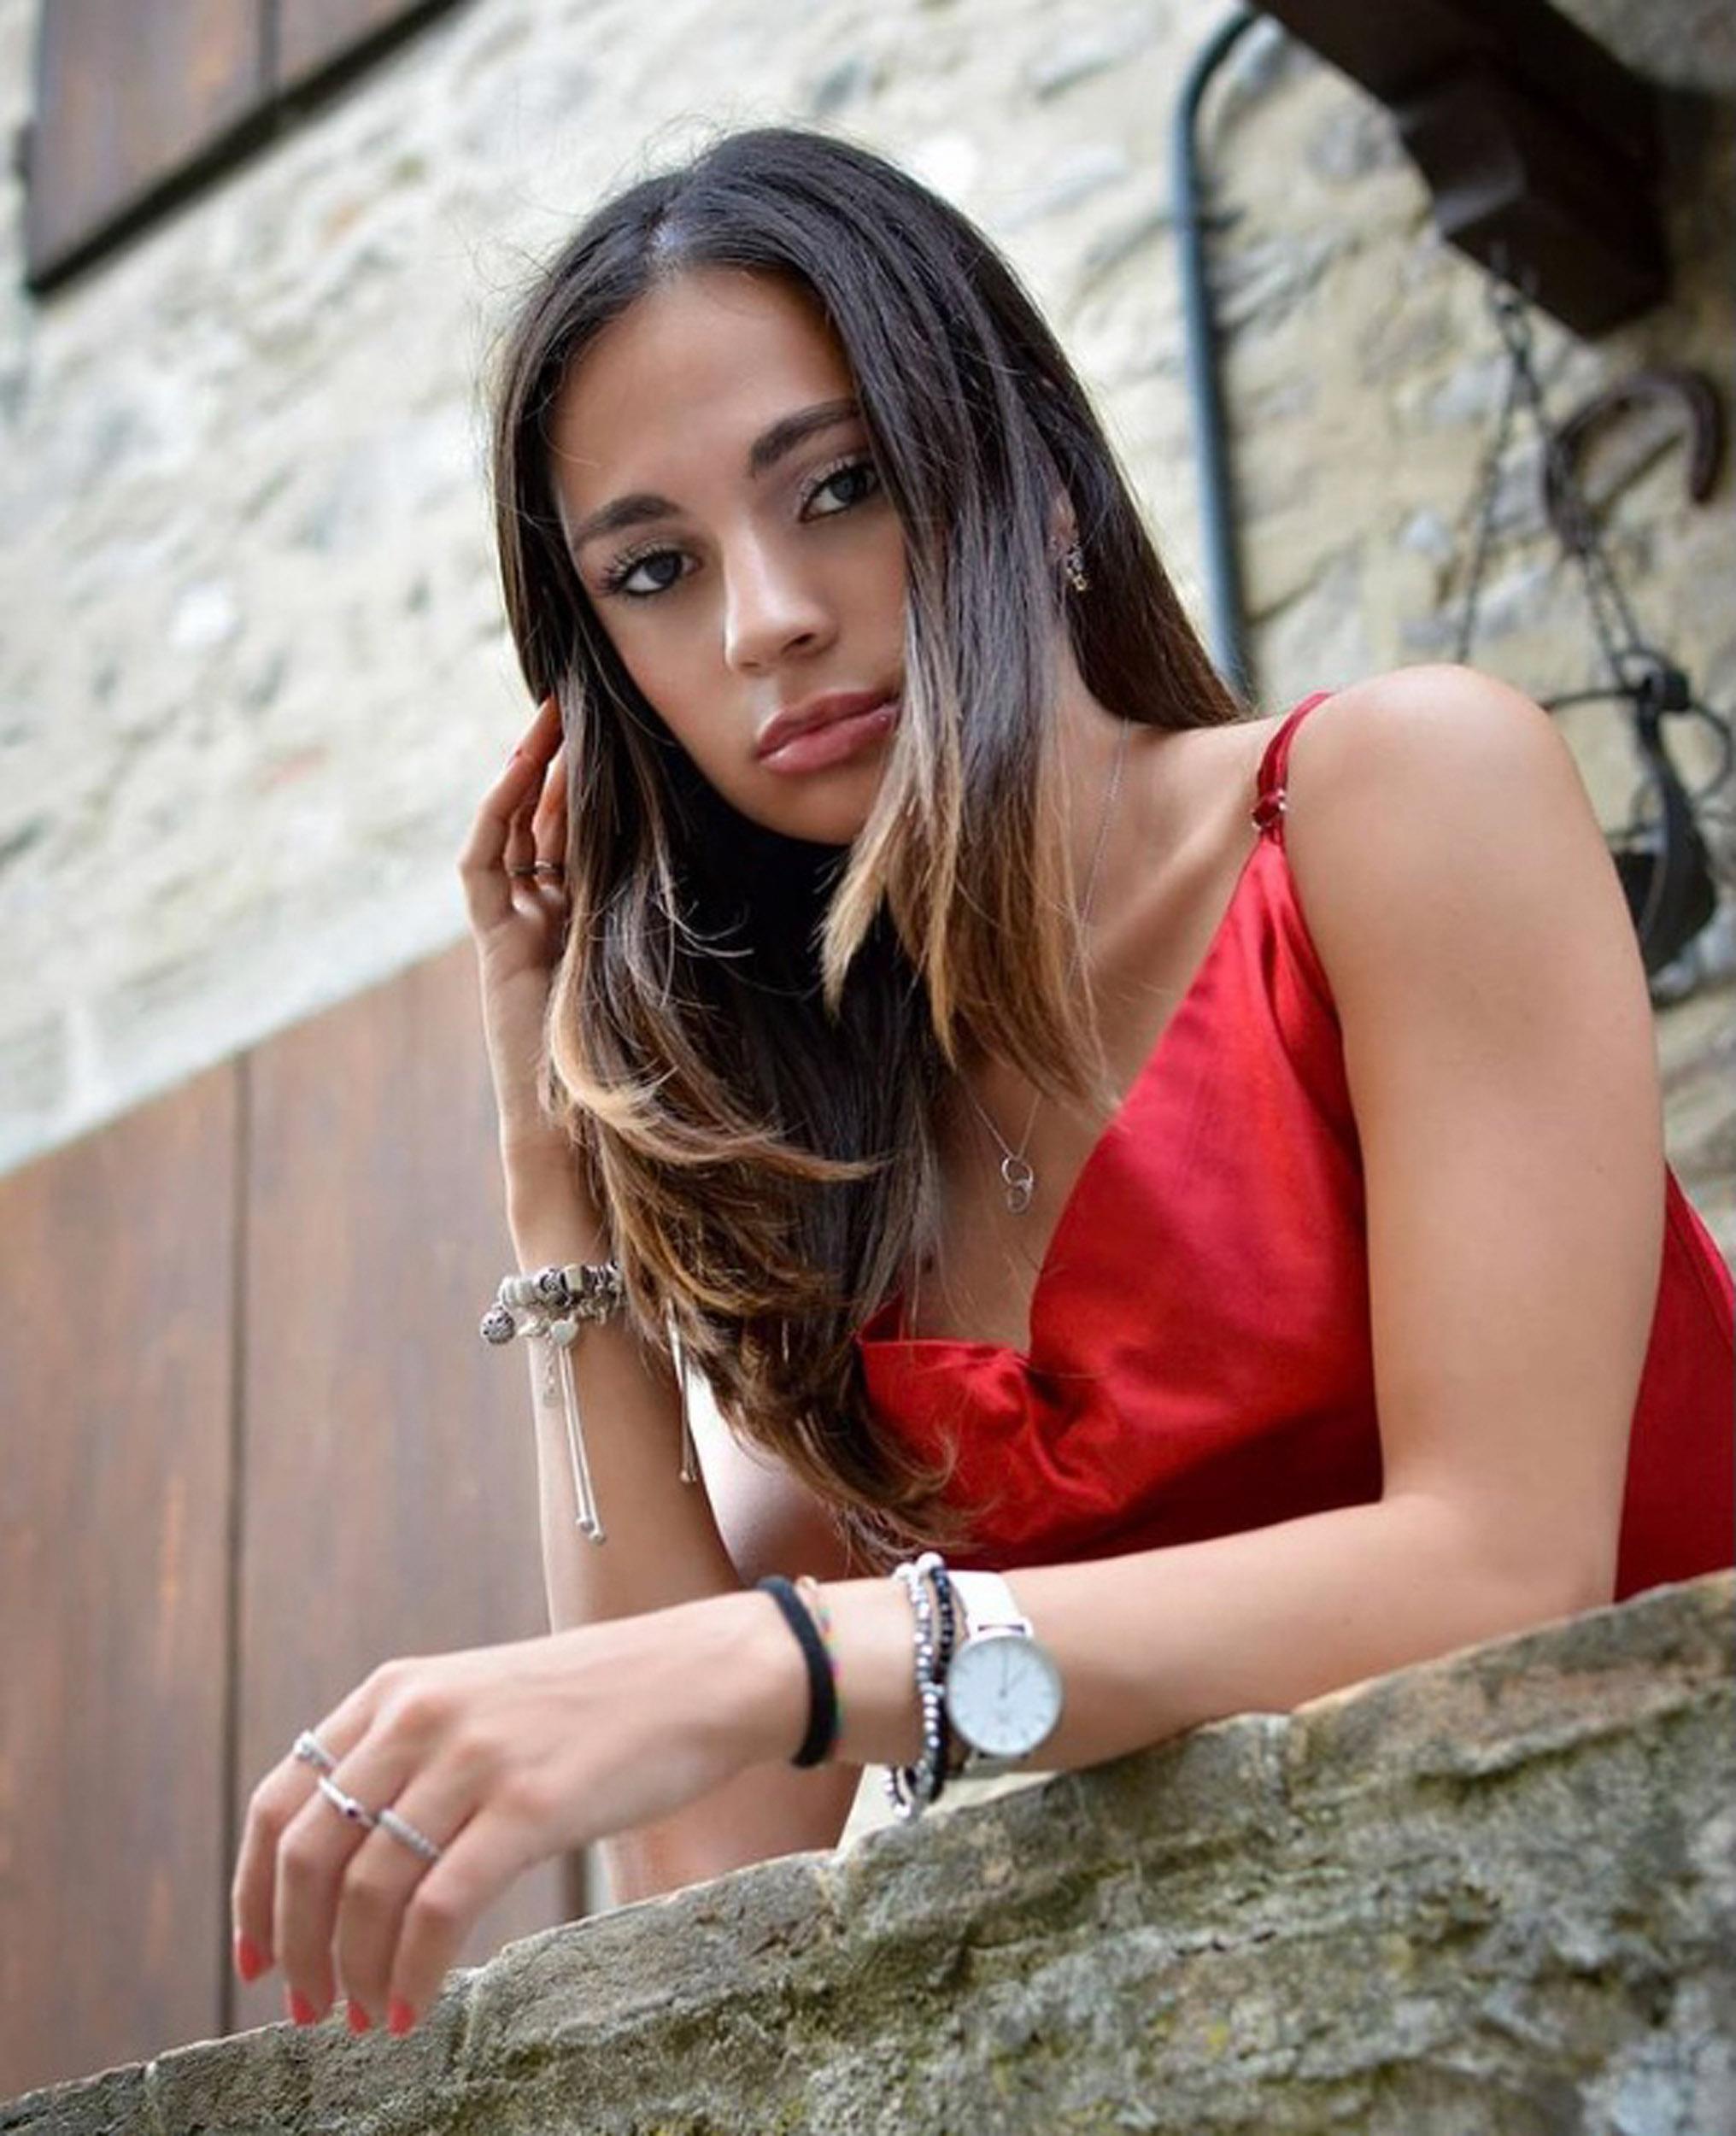 Categorie: Portrait, Glamour, Fashion - Ph: TEOPH87- Model: SHARON SAVINO - Location: Castello di Torrechiara, Parma, PR, Italia